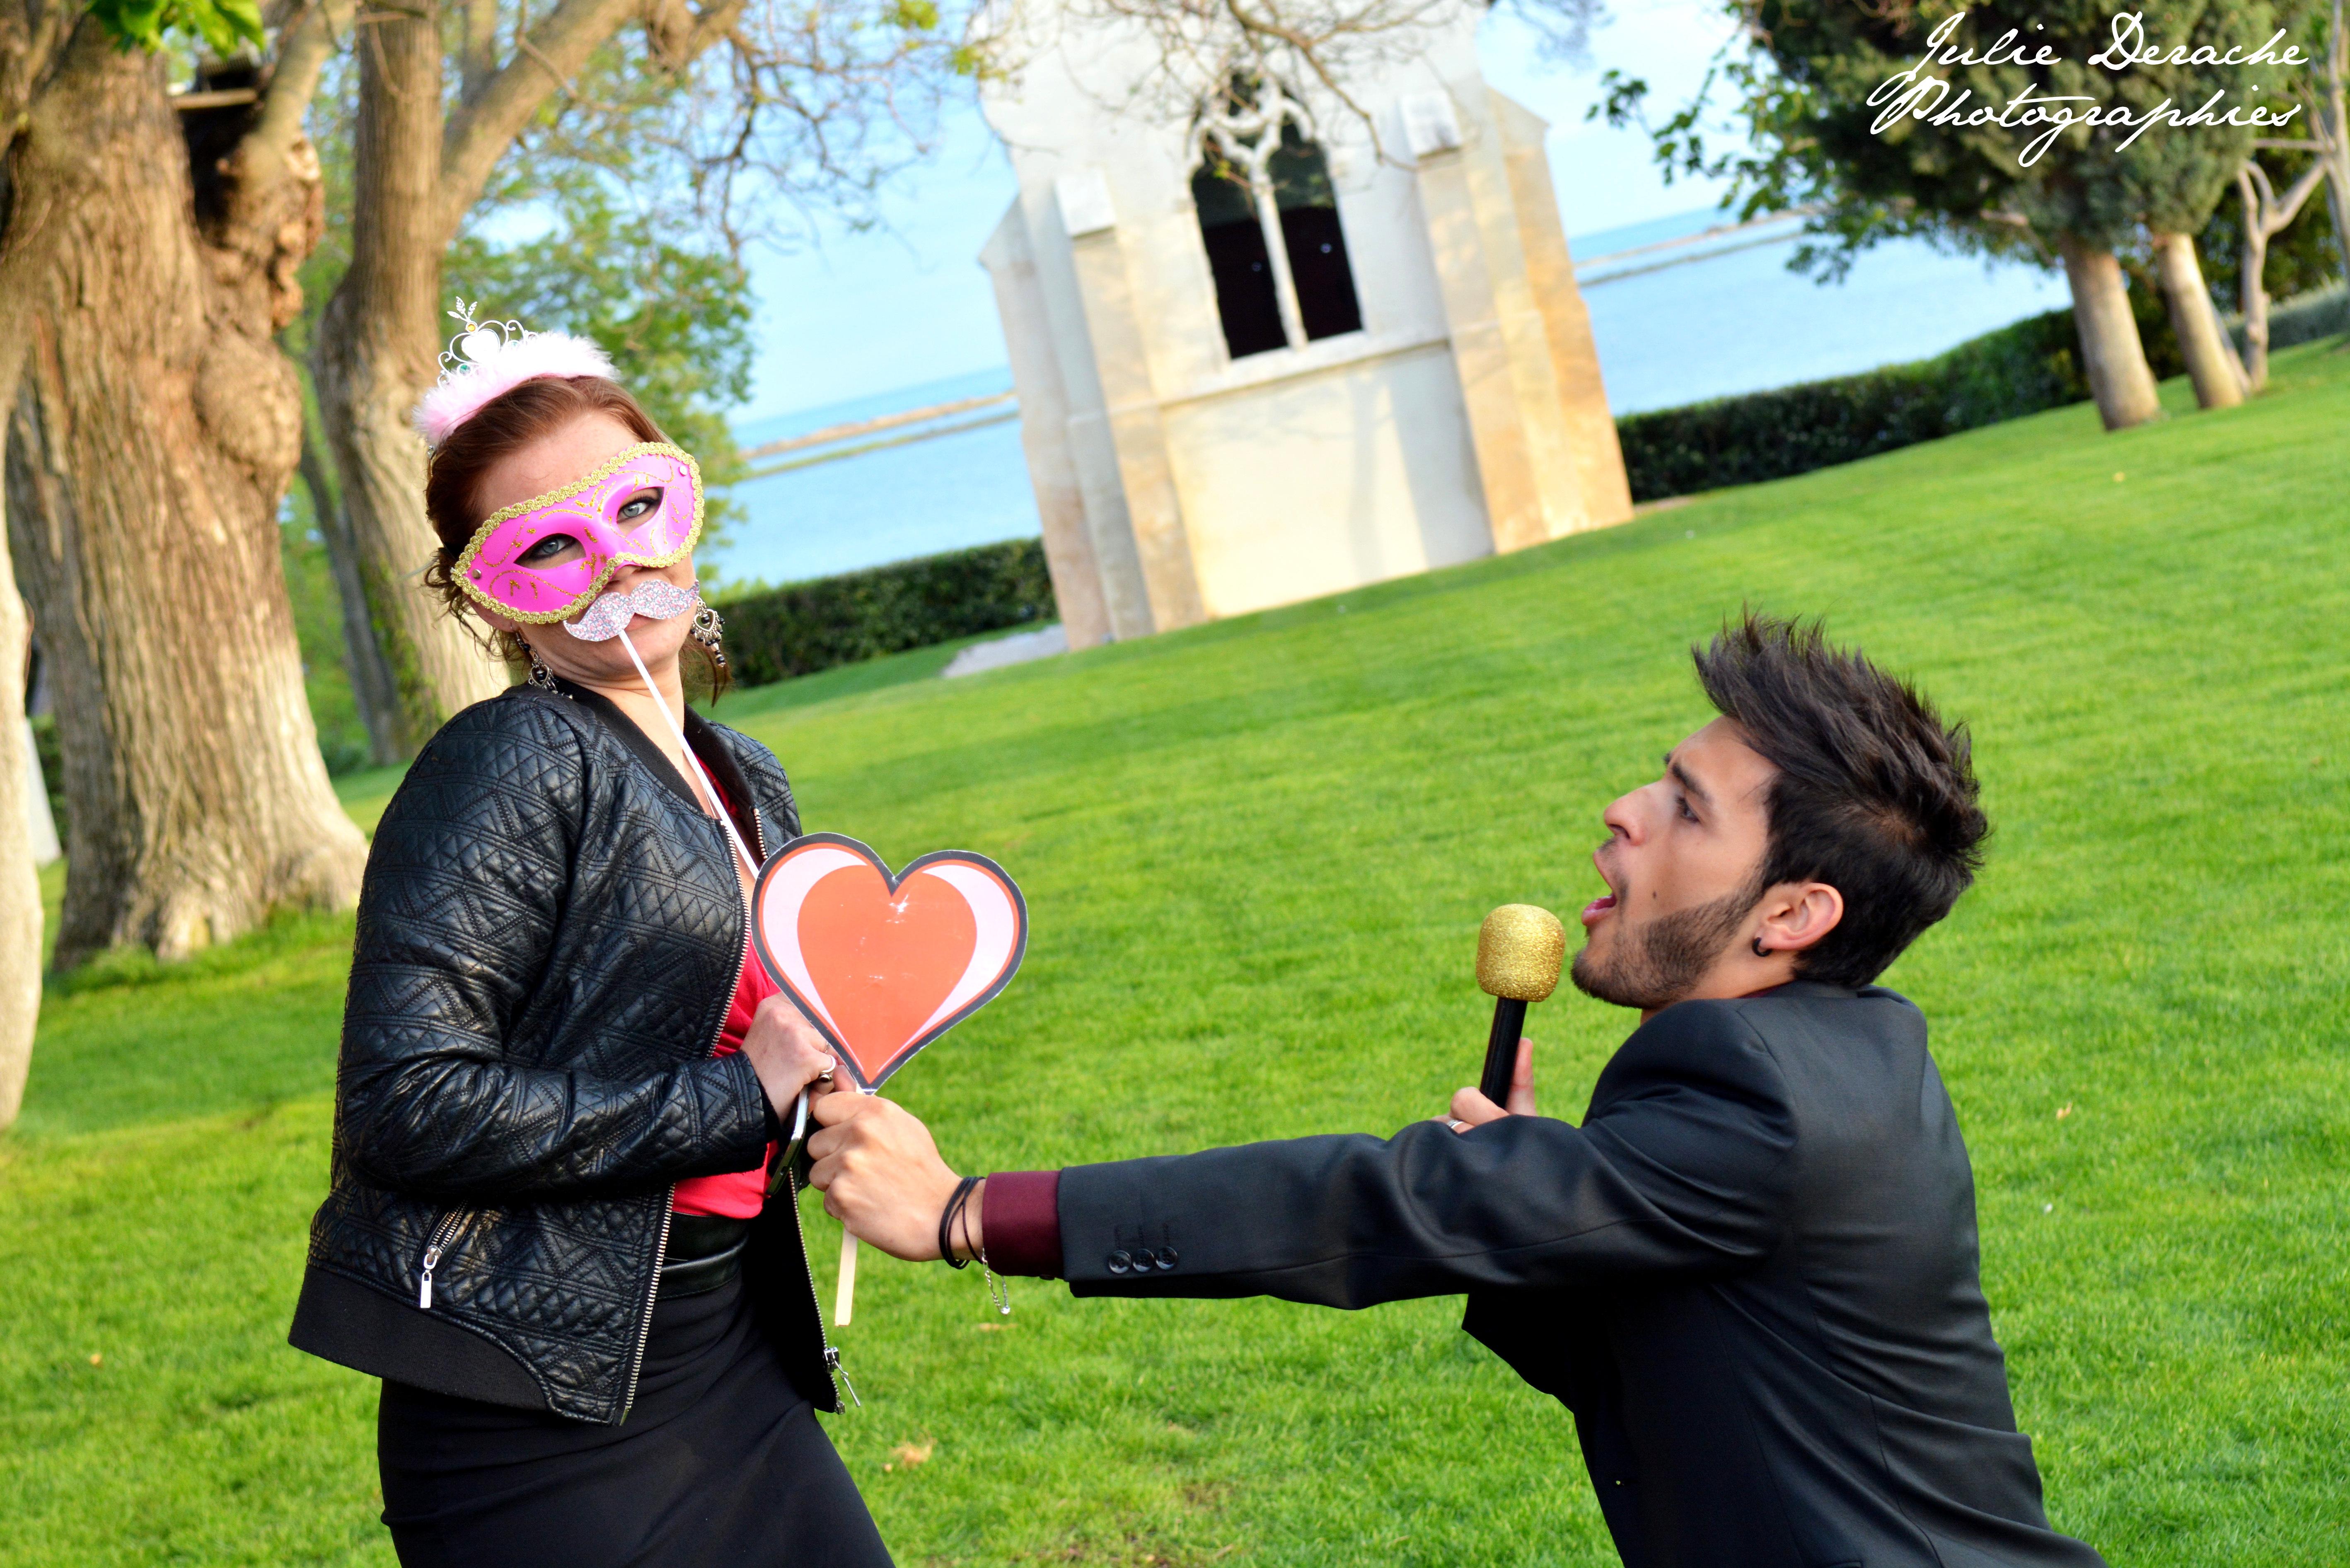 Photographe+mariage+gay+montpellier+(2)